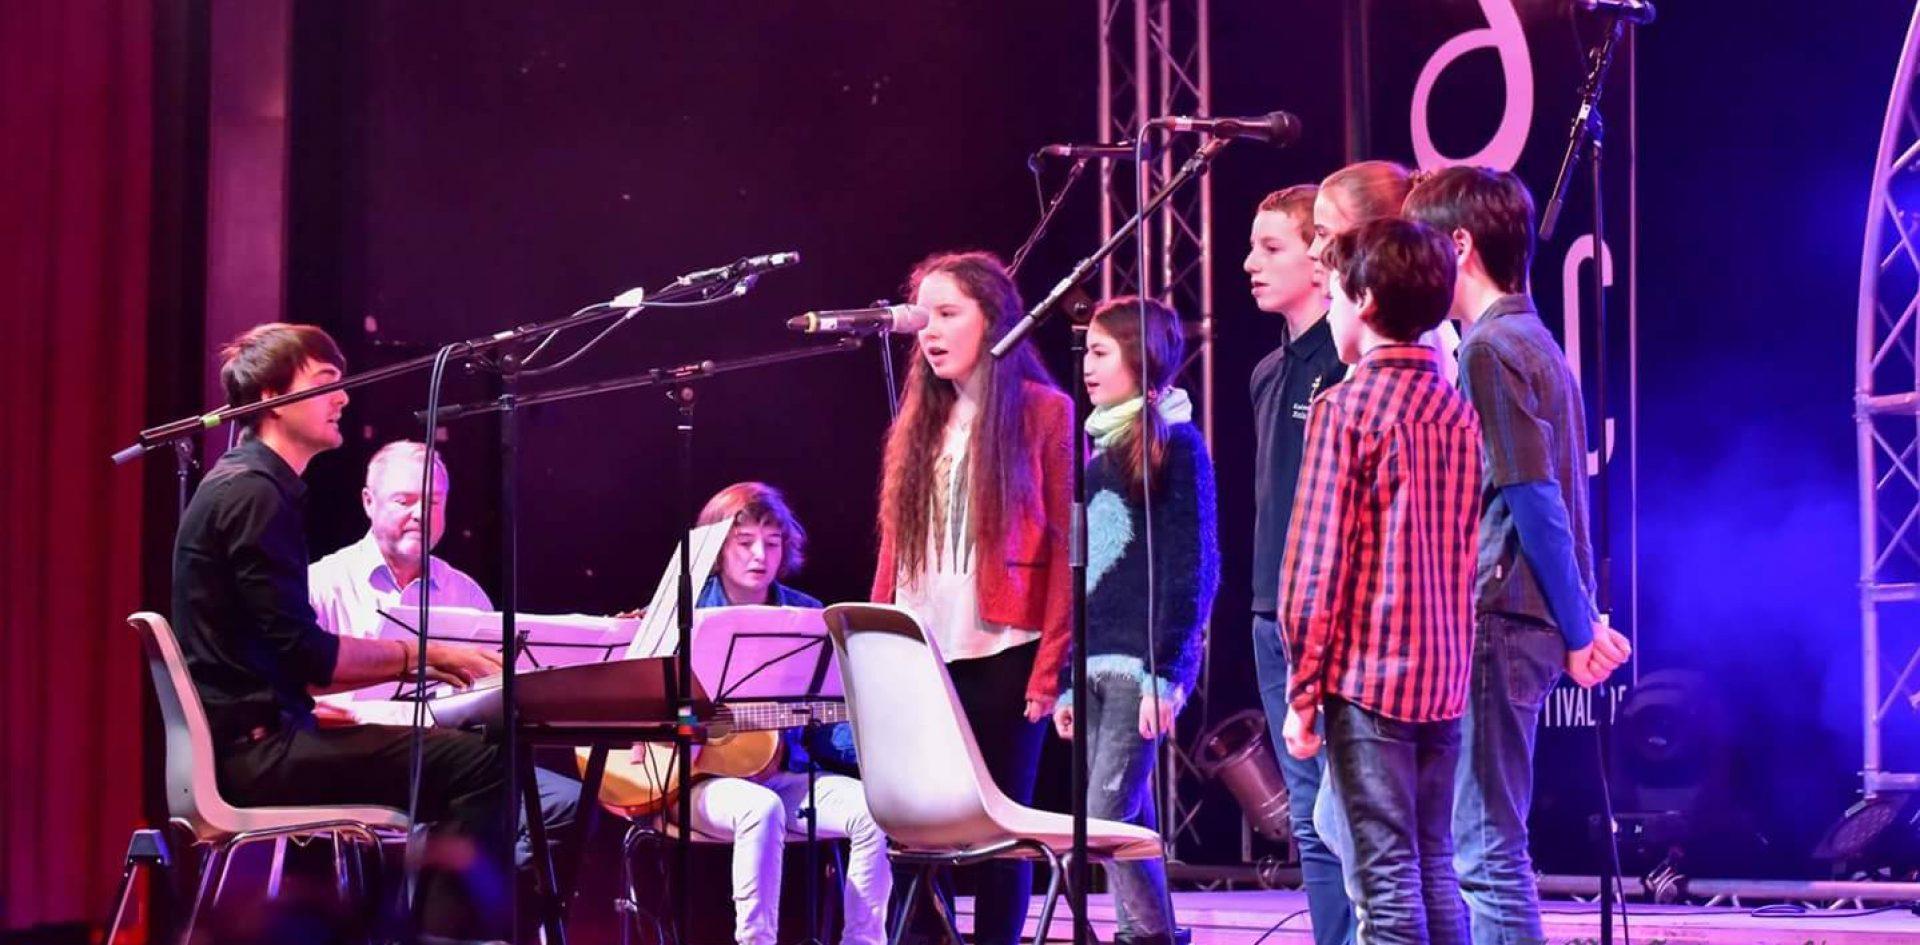 Gesangverein Harmonie Thierhaupten e.V.